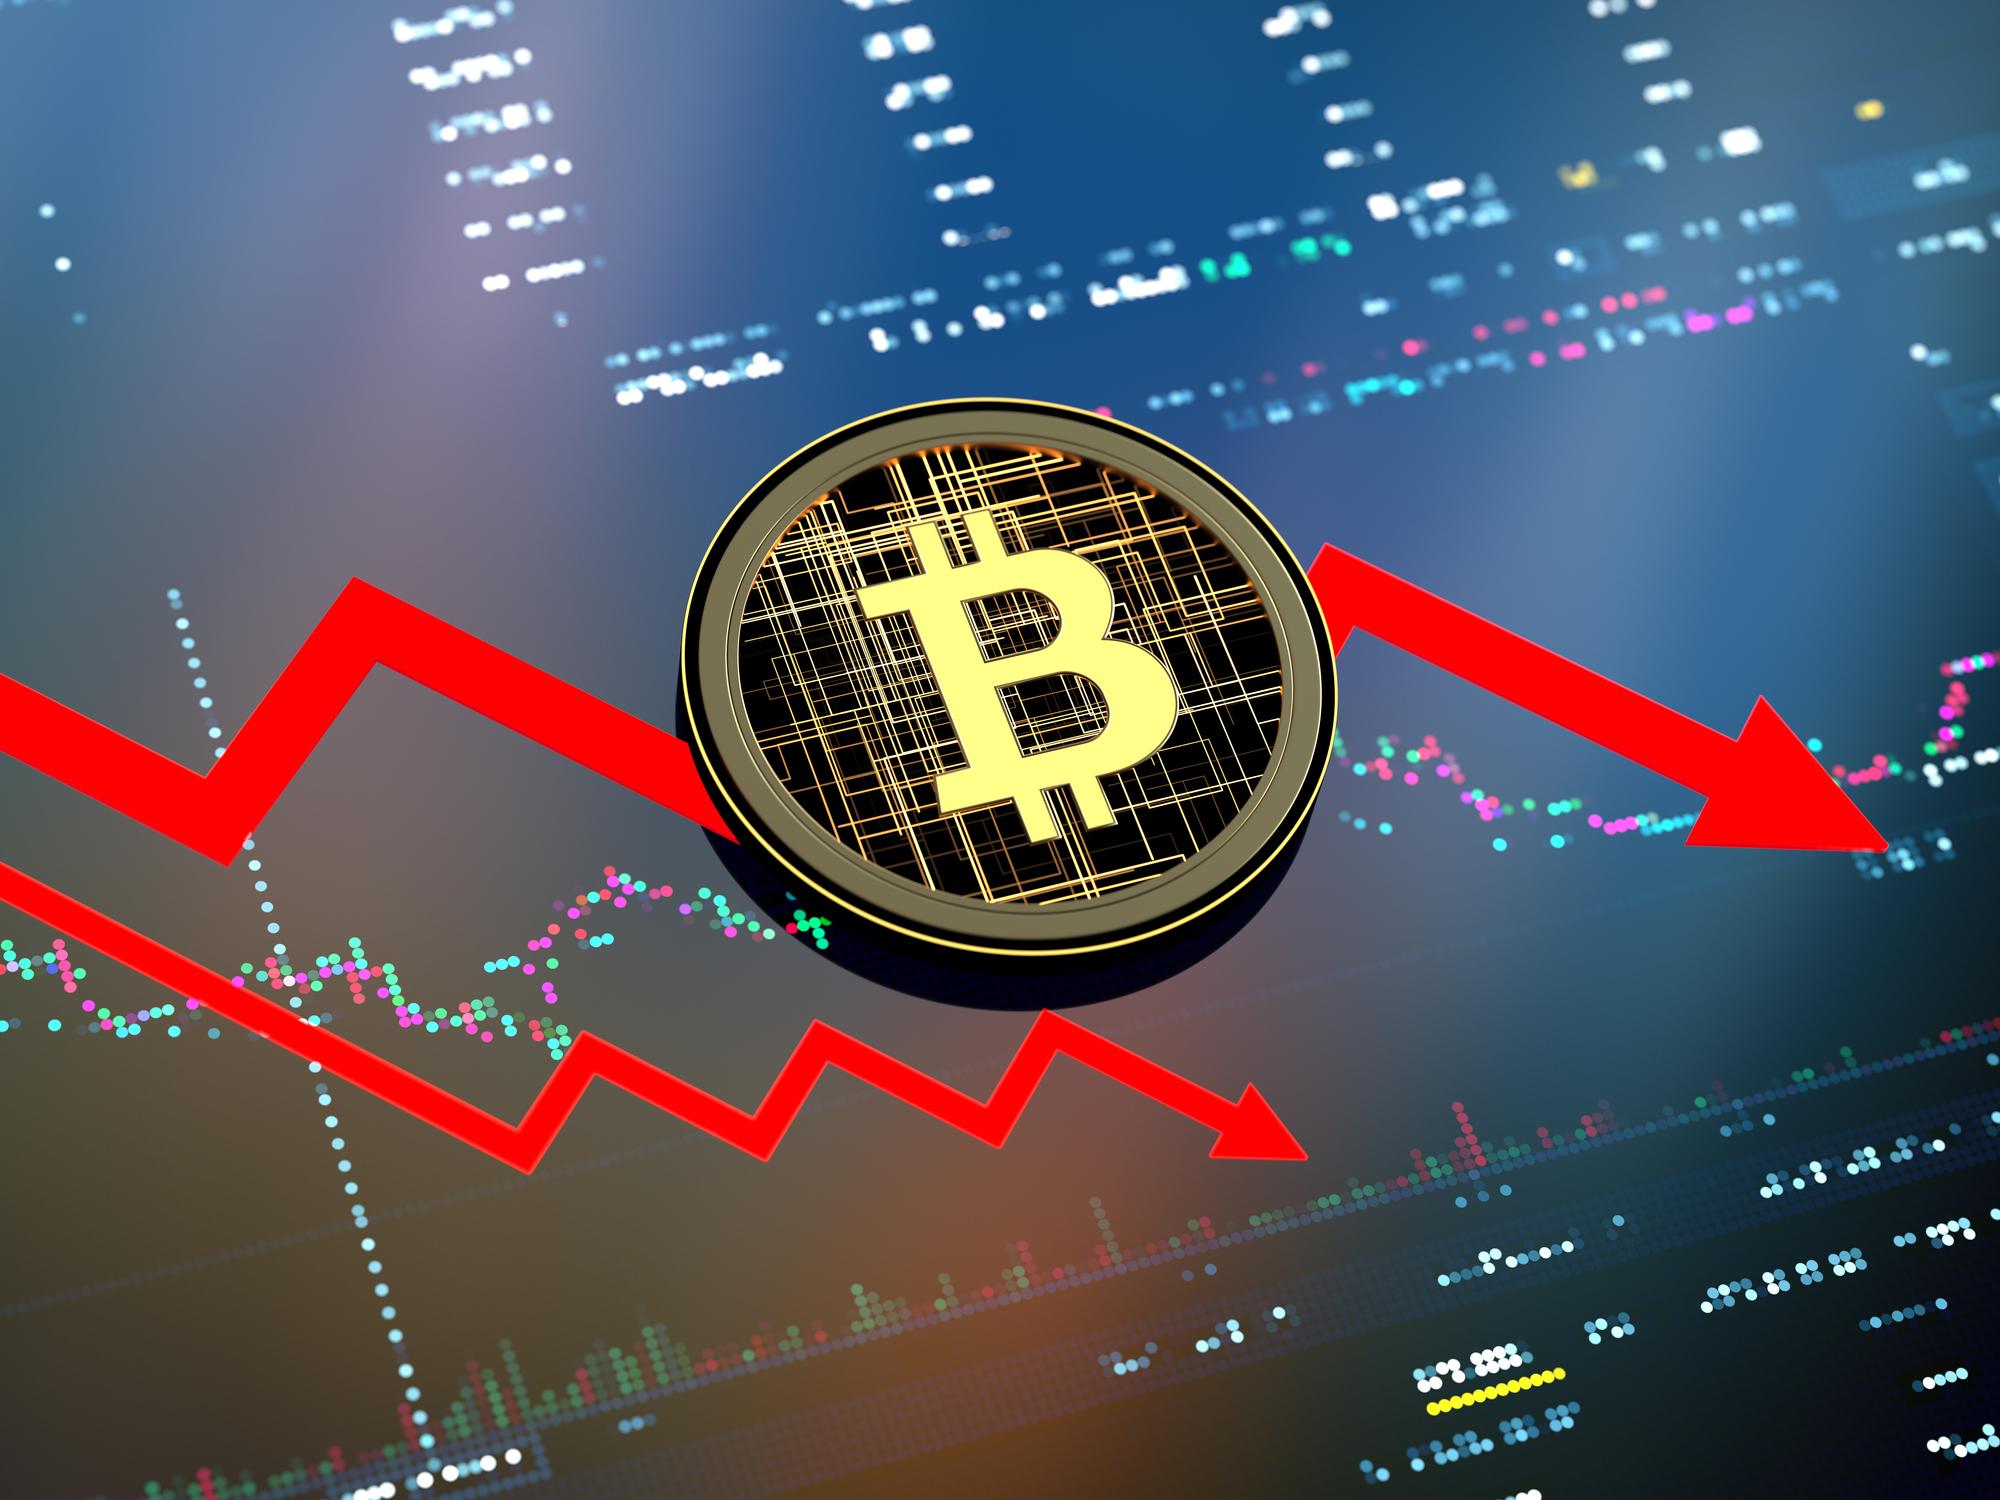 Why Bitcoin, Dogecoin, and Etherium Crashed Today @themotleyfool #stocks $DOGE $BTC $ETH thumbnail